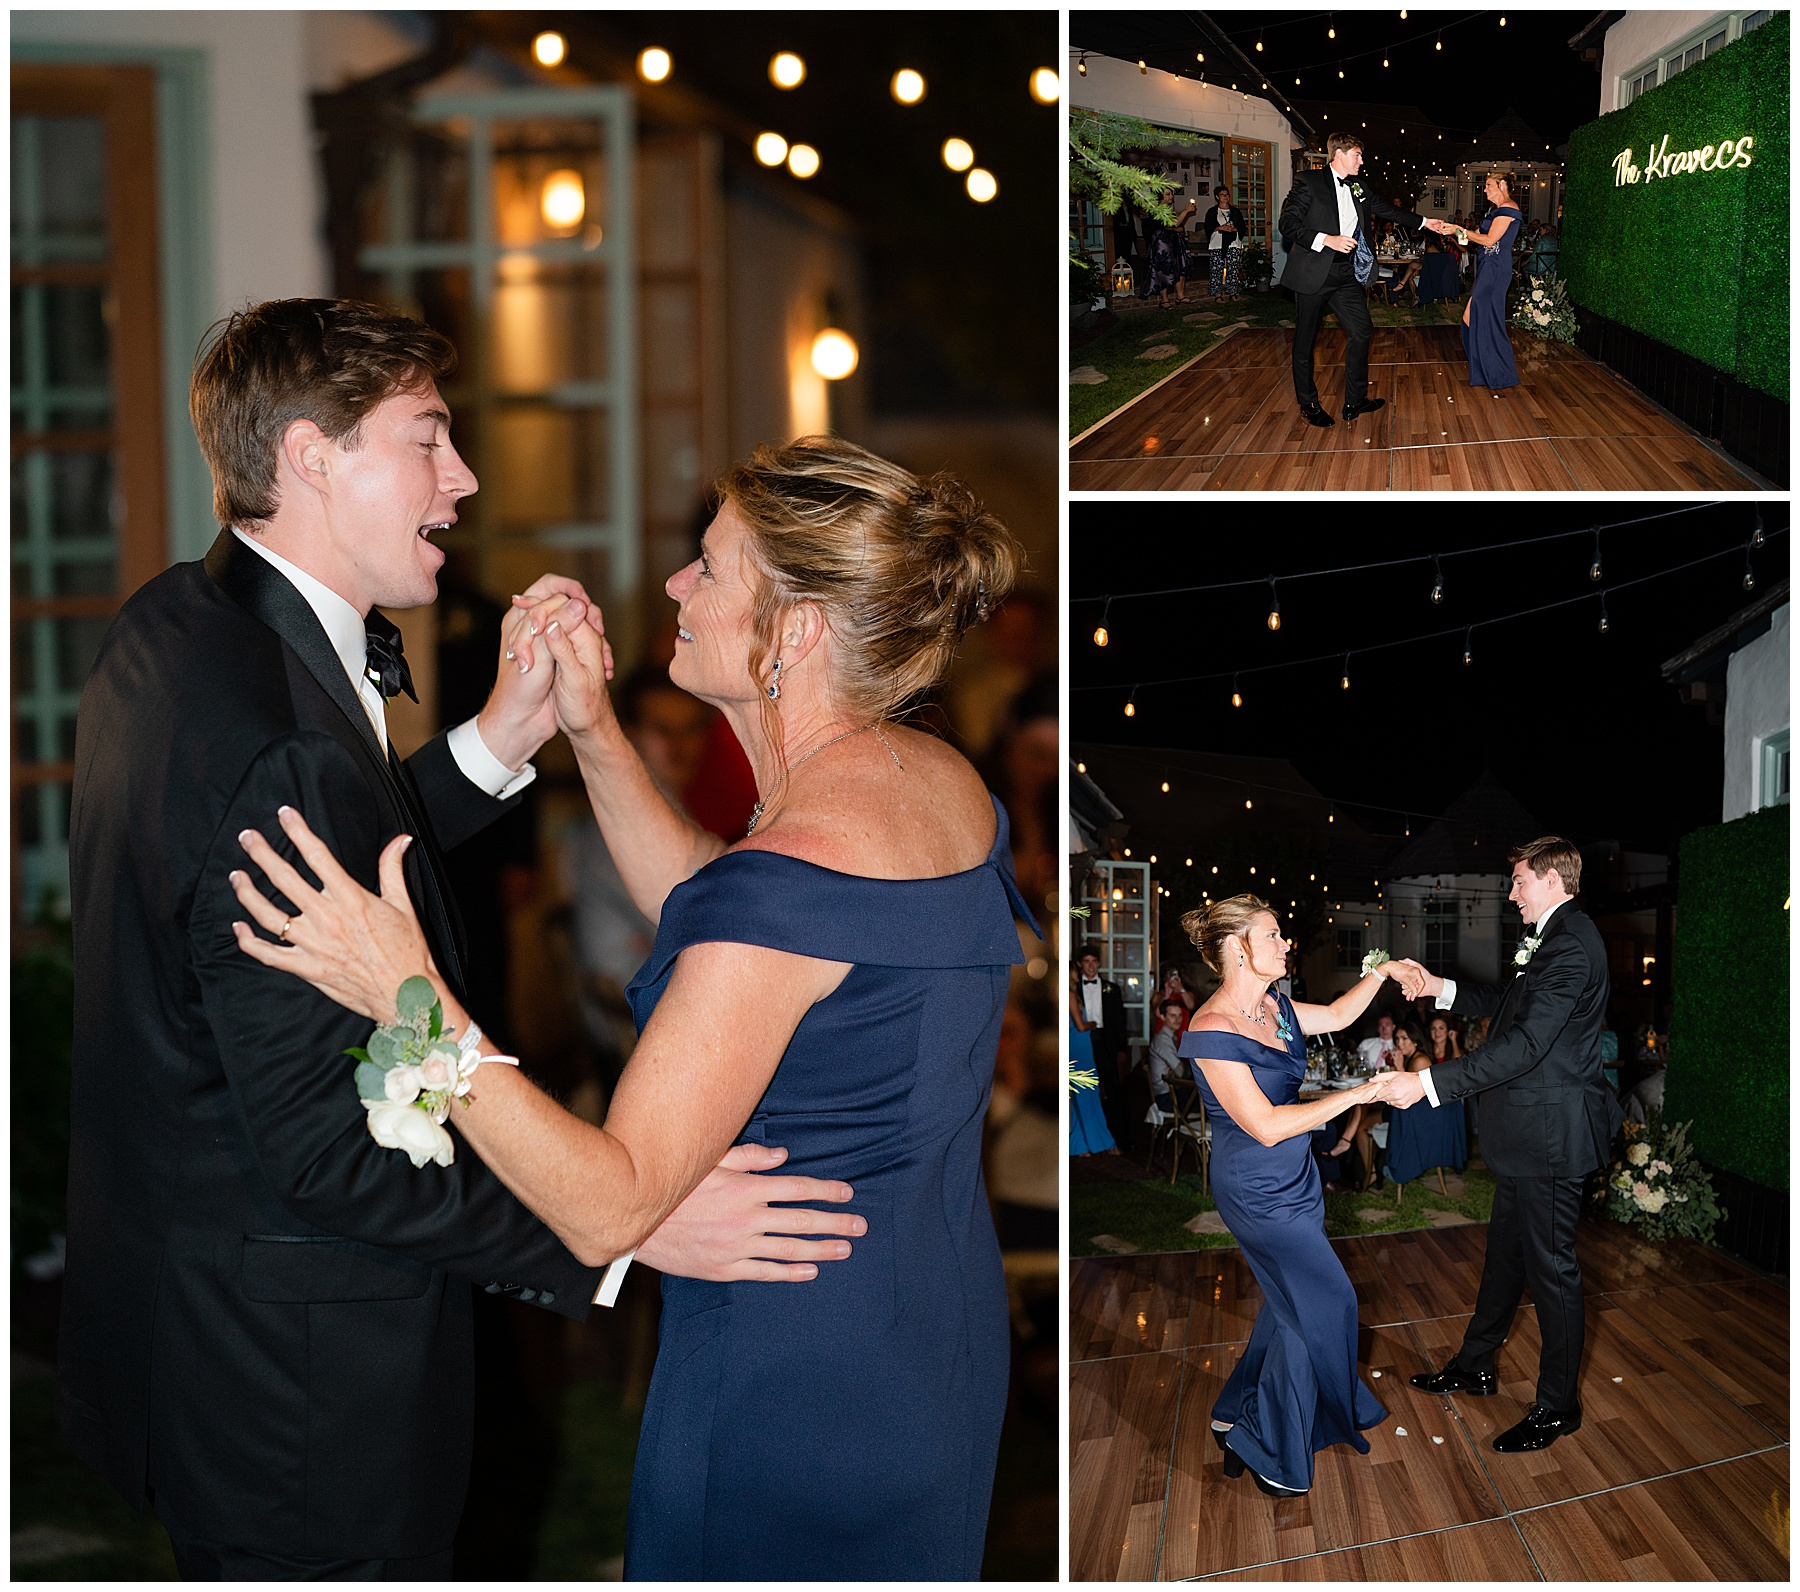 backyard wedding son and mom dance